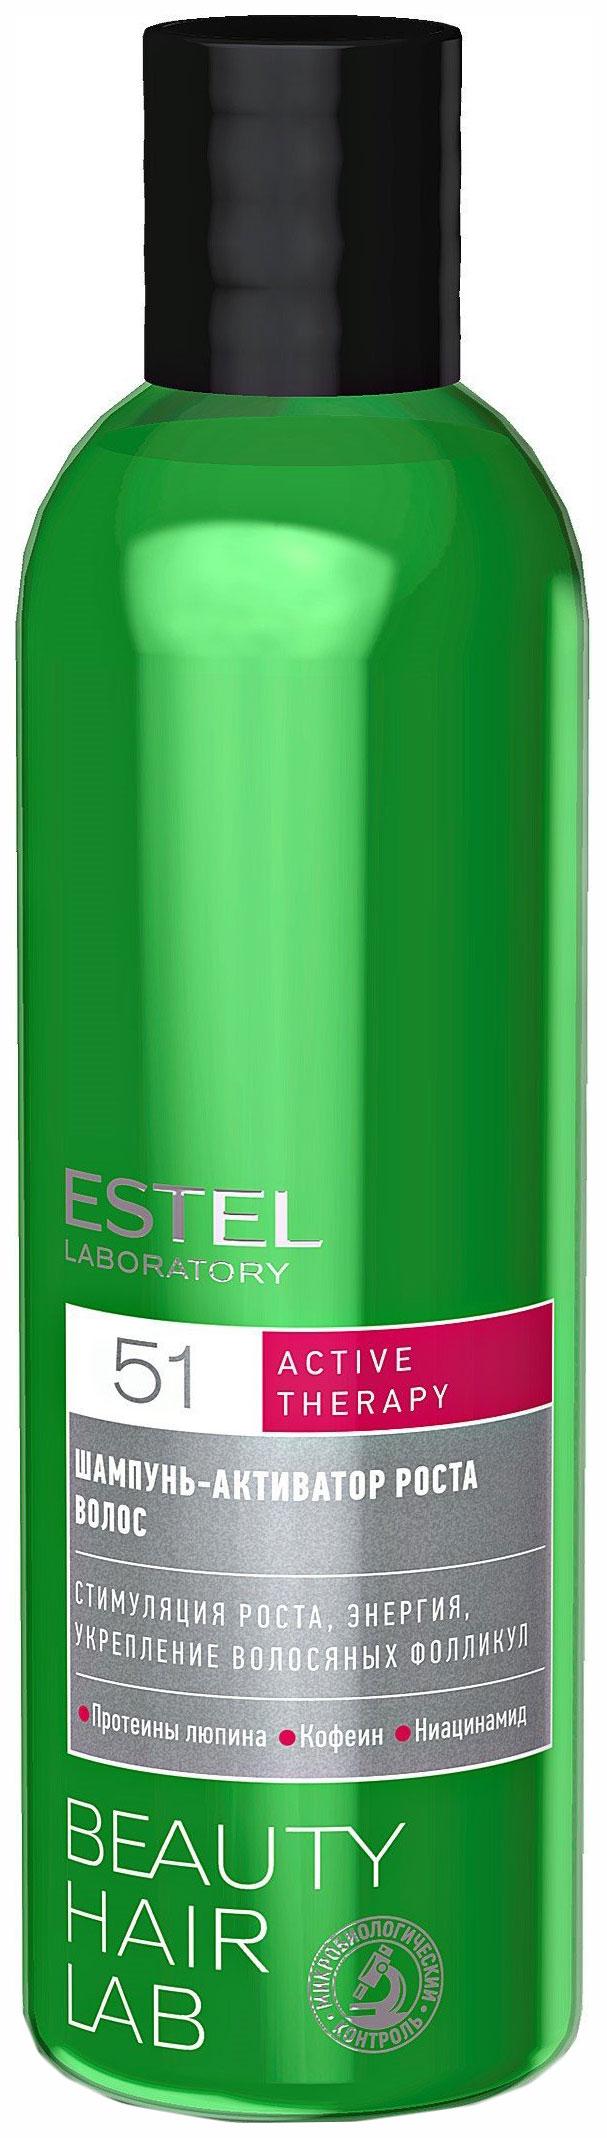 Шампунь Estel Professional Beauty Hair Lab 51 Active Therapy 250 мл